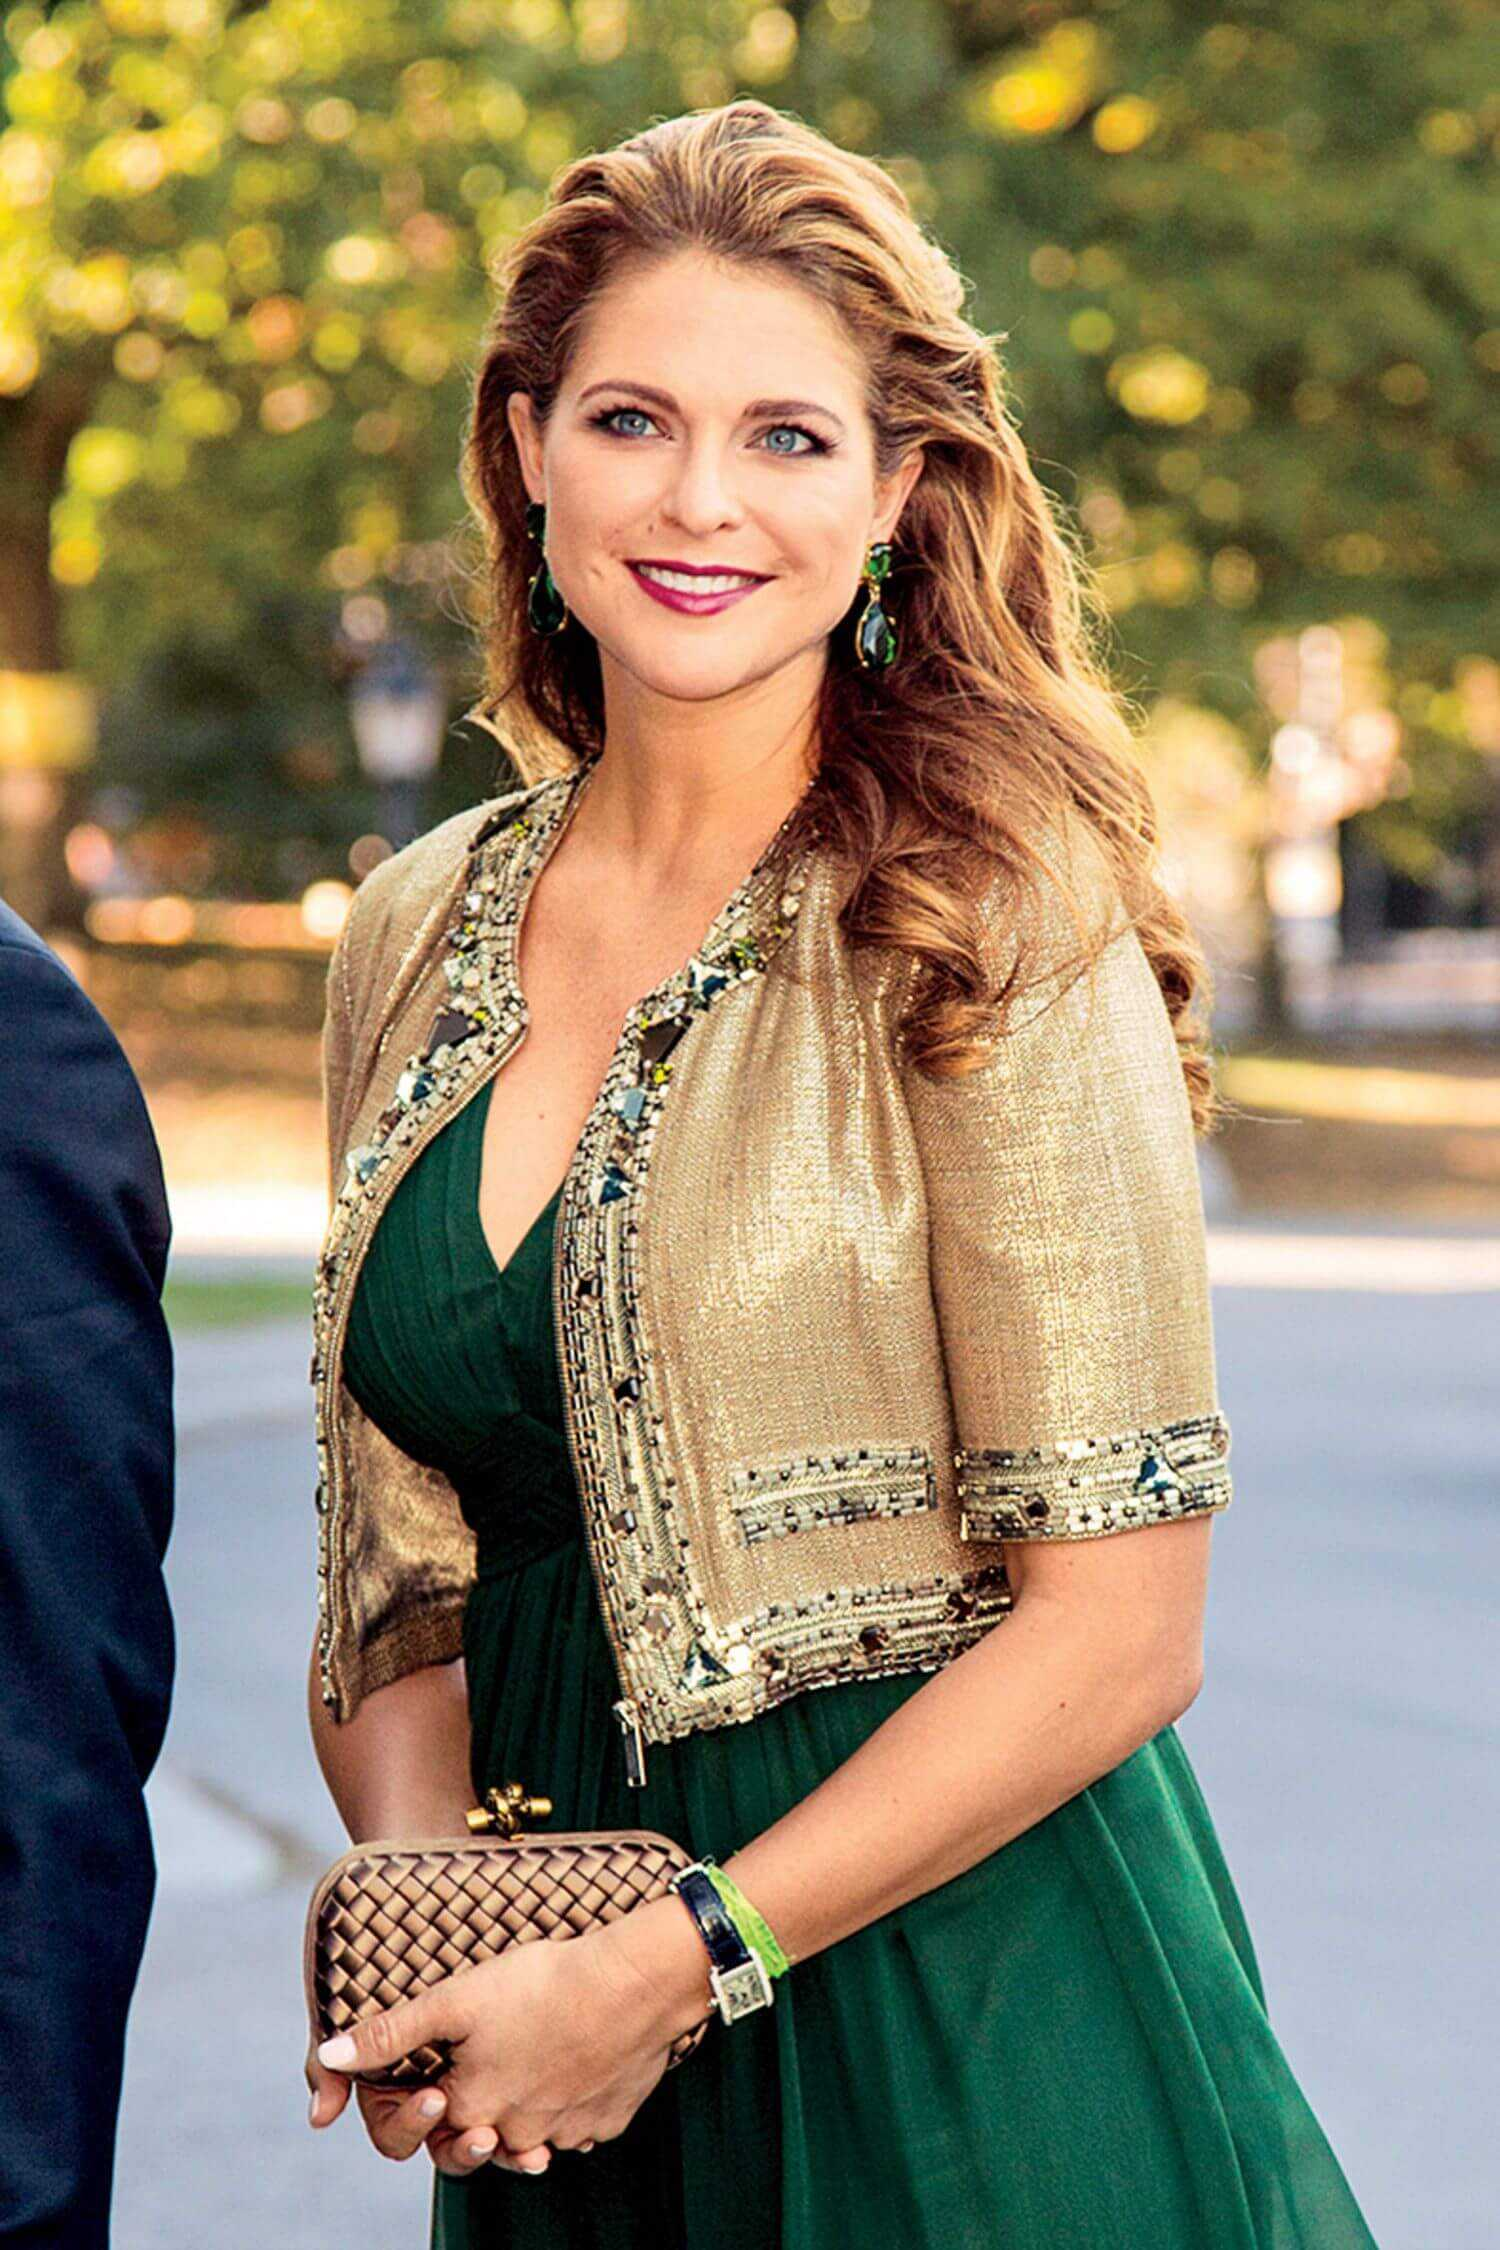 princess madeleine, duchess of halsingland and gastrikland cute smile